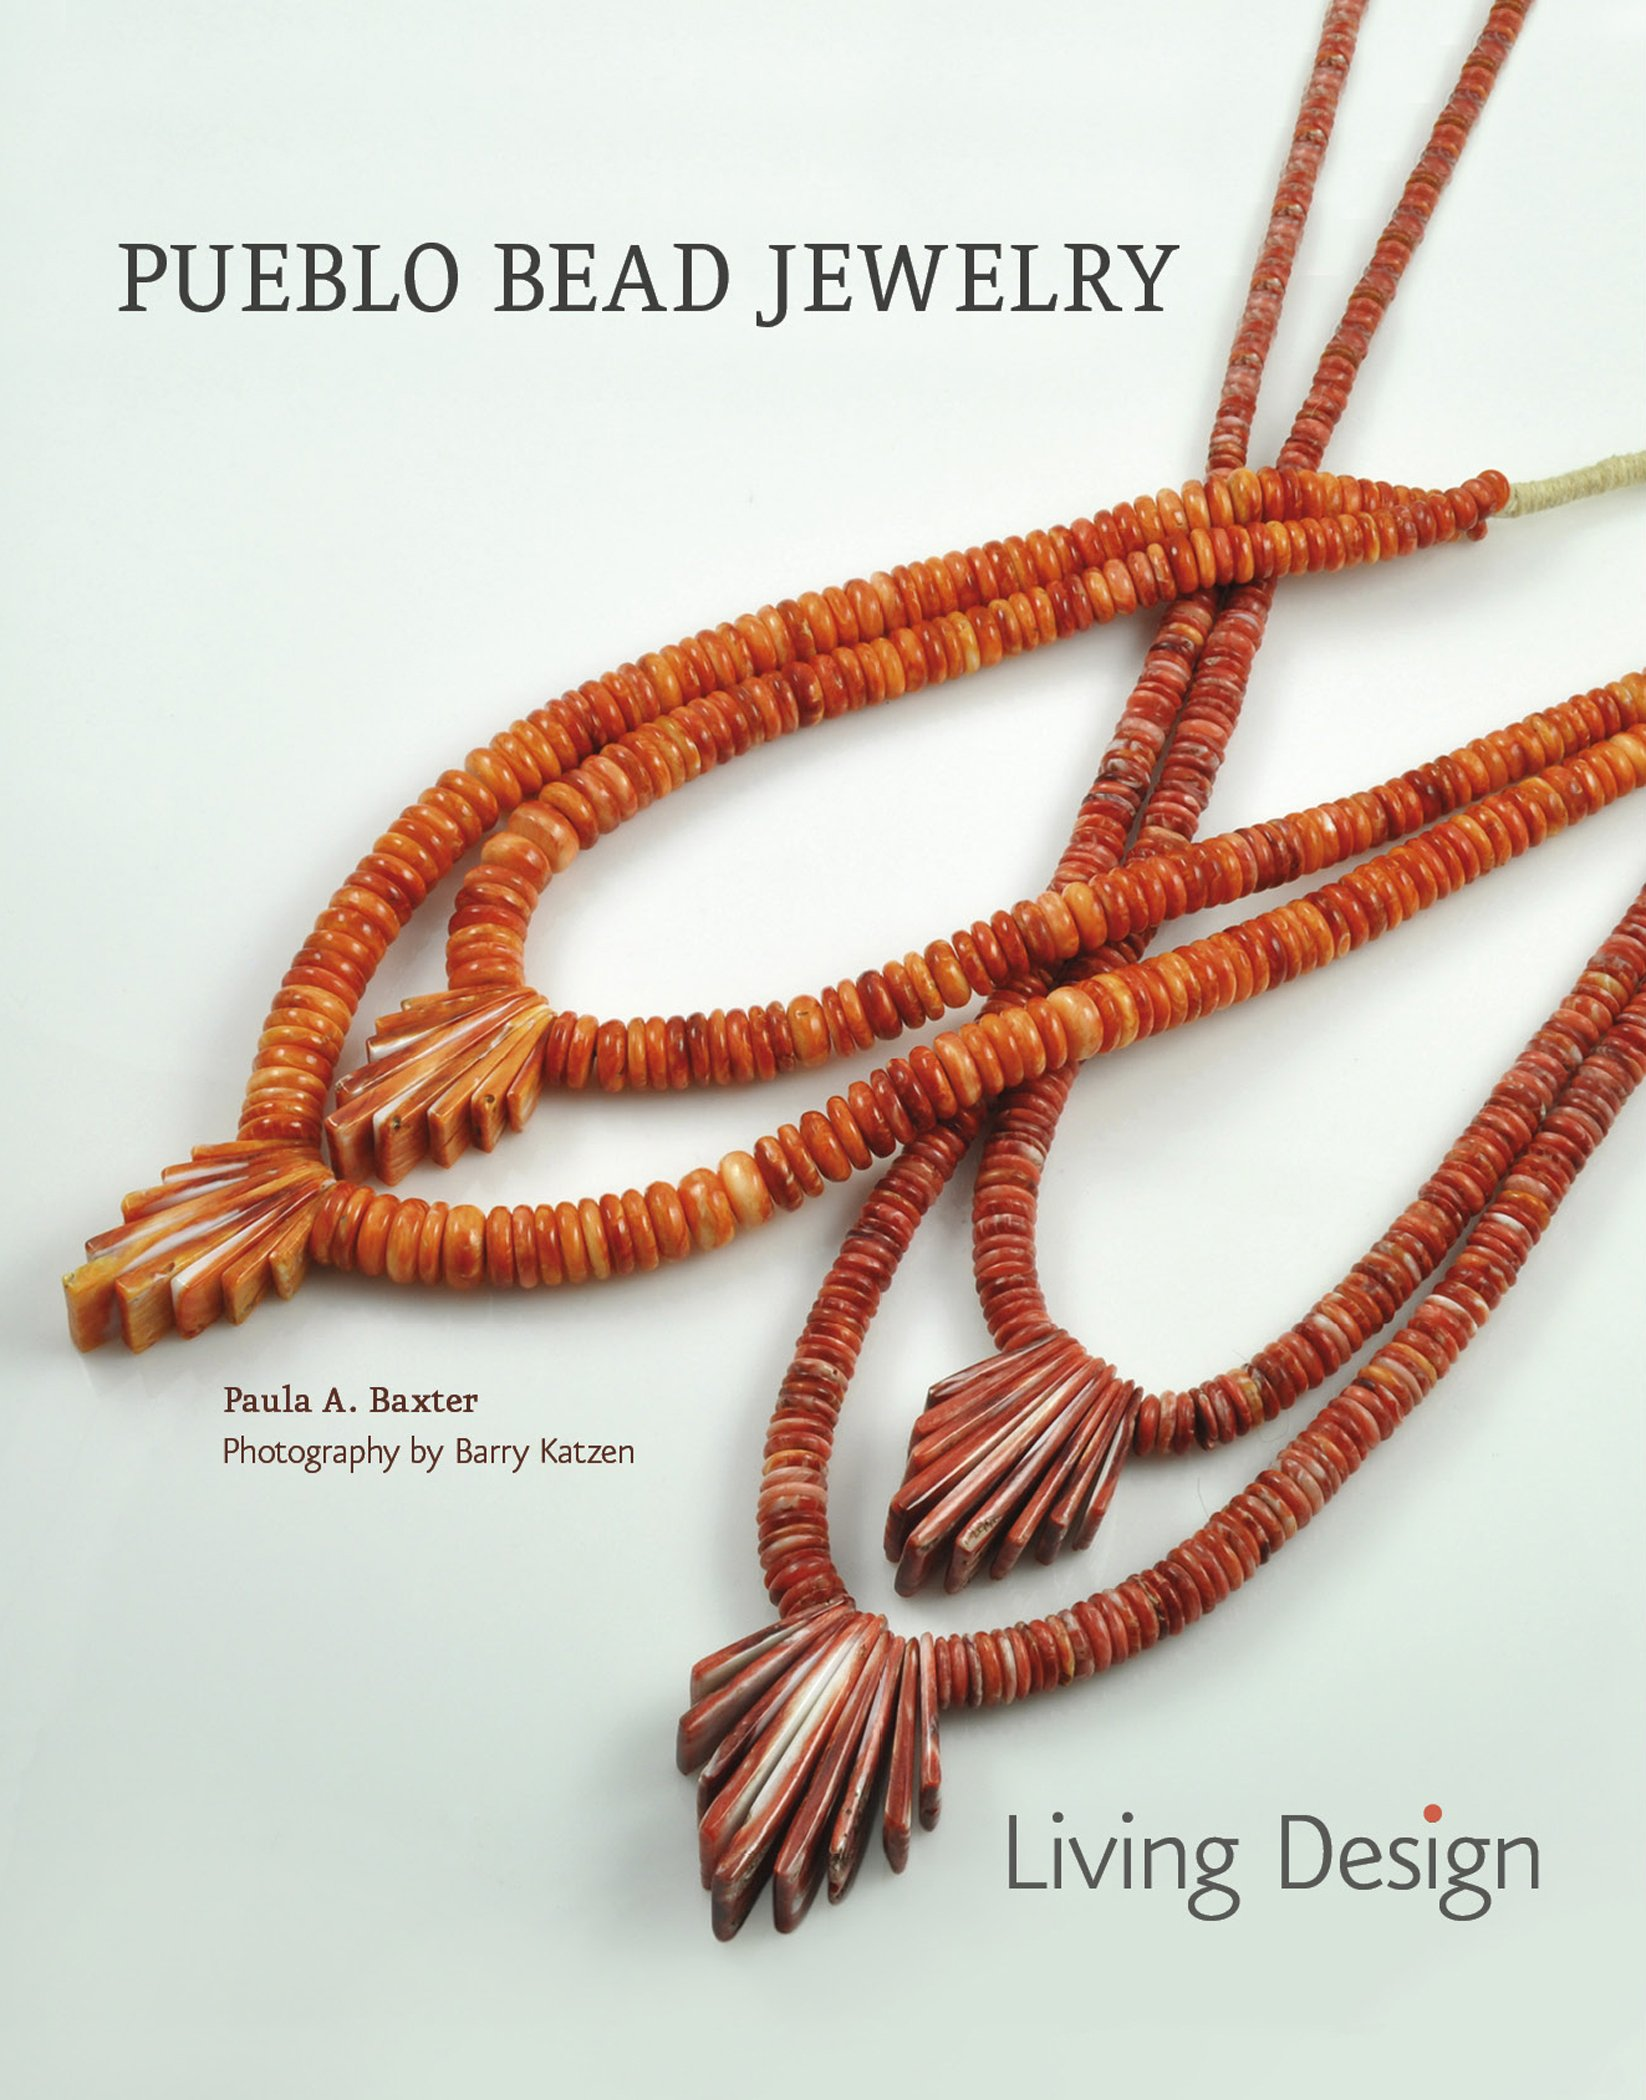 d041f7cb2cc Pueblo Bead Jewelry  Living Design  Paula A. Baxter